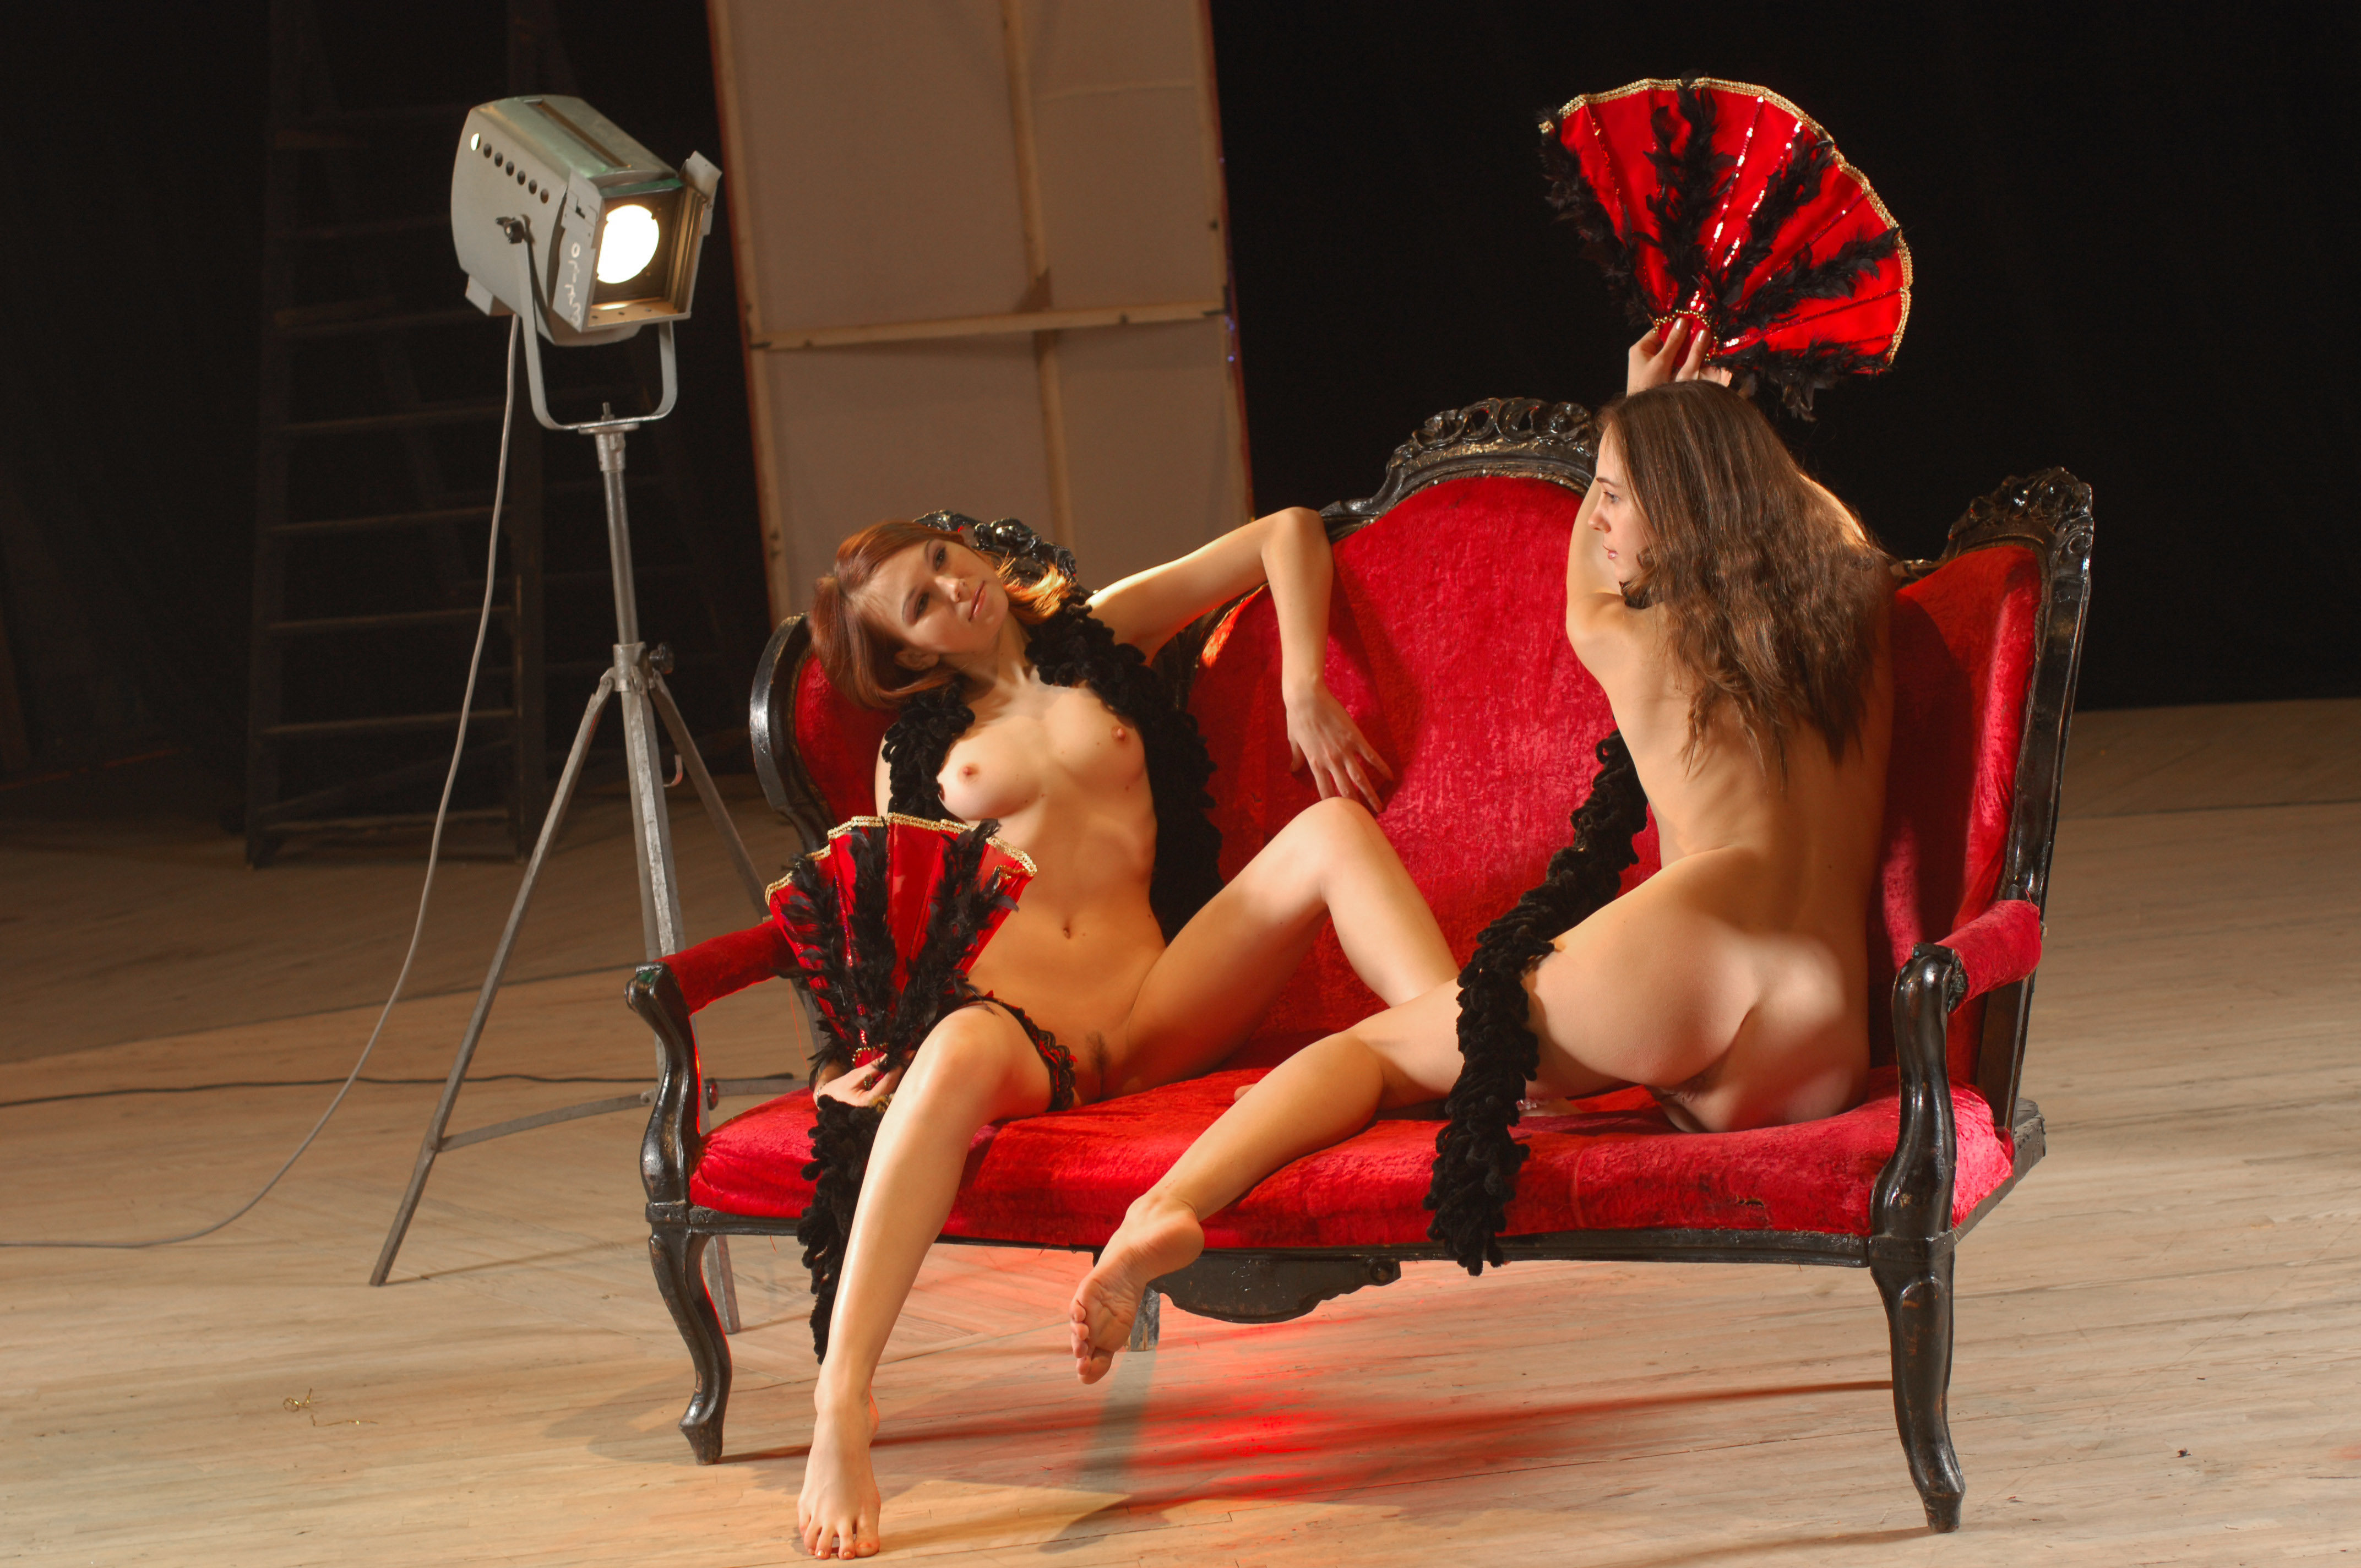 Фото эротика в театре 2 фотография